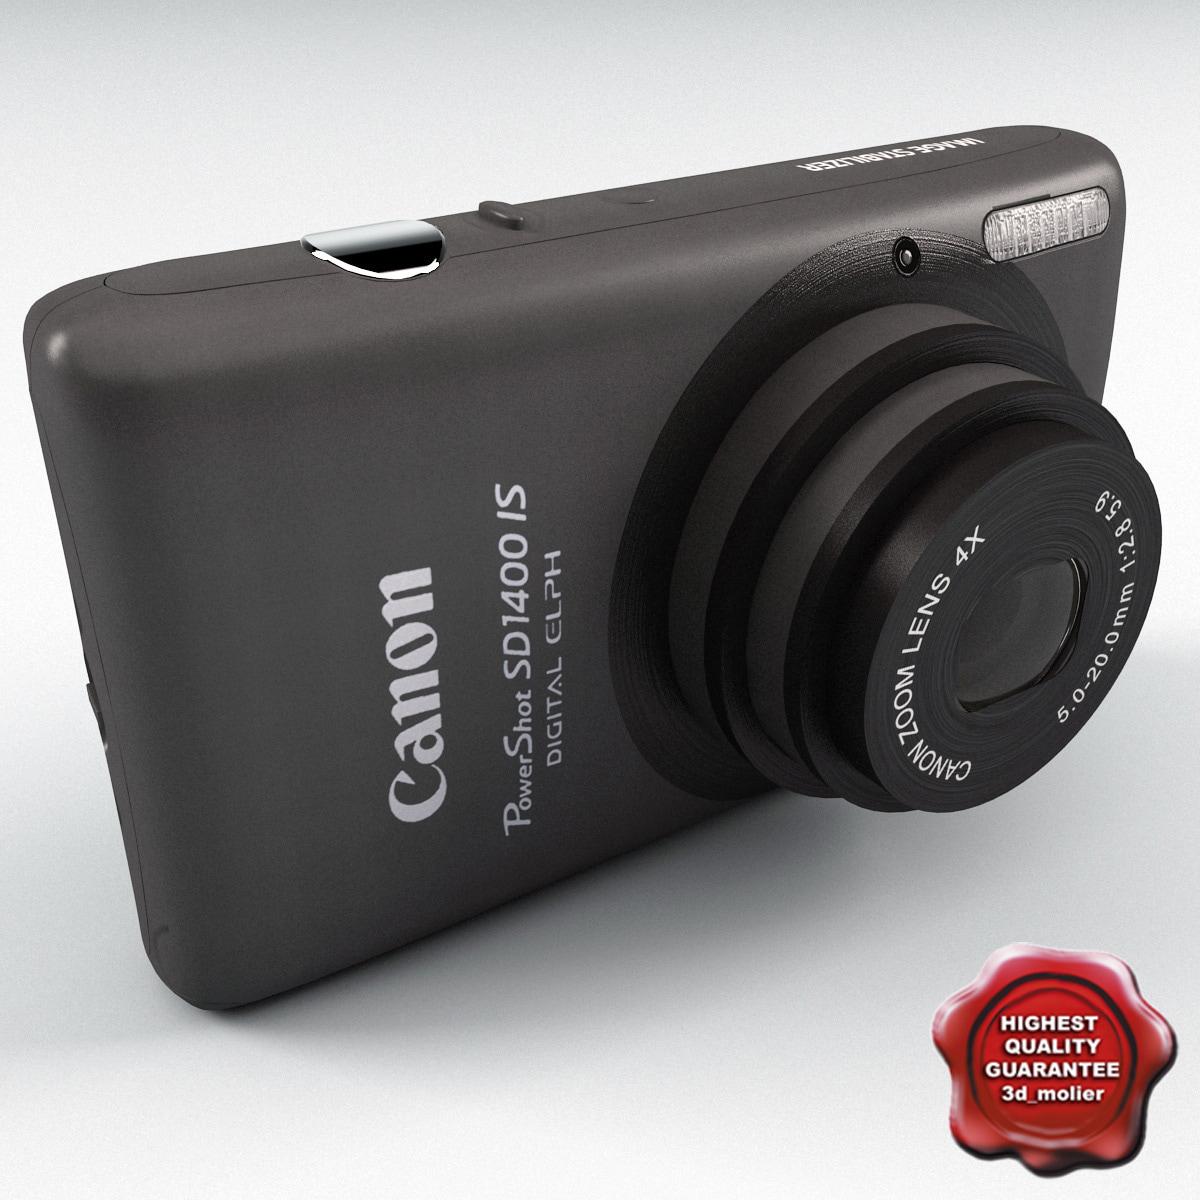 Canon_PowerShot_SD_1400_IS_00.jpg